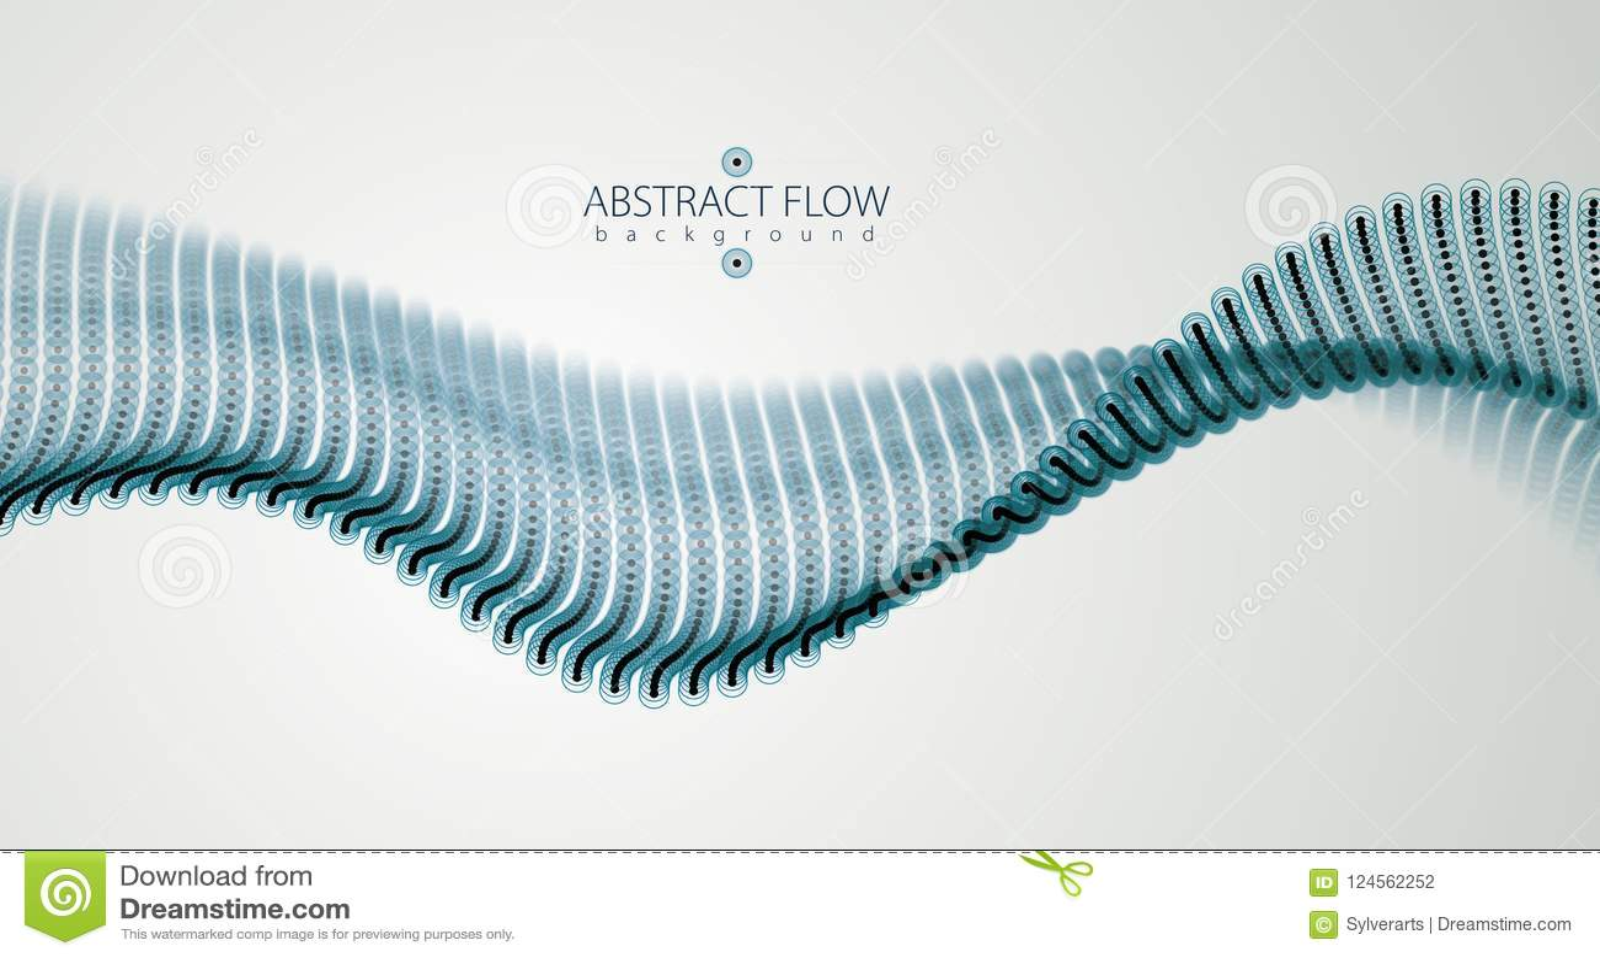 Onda de fluxo das partículas, movimento sadio dinâmico illustra do vetor 3d